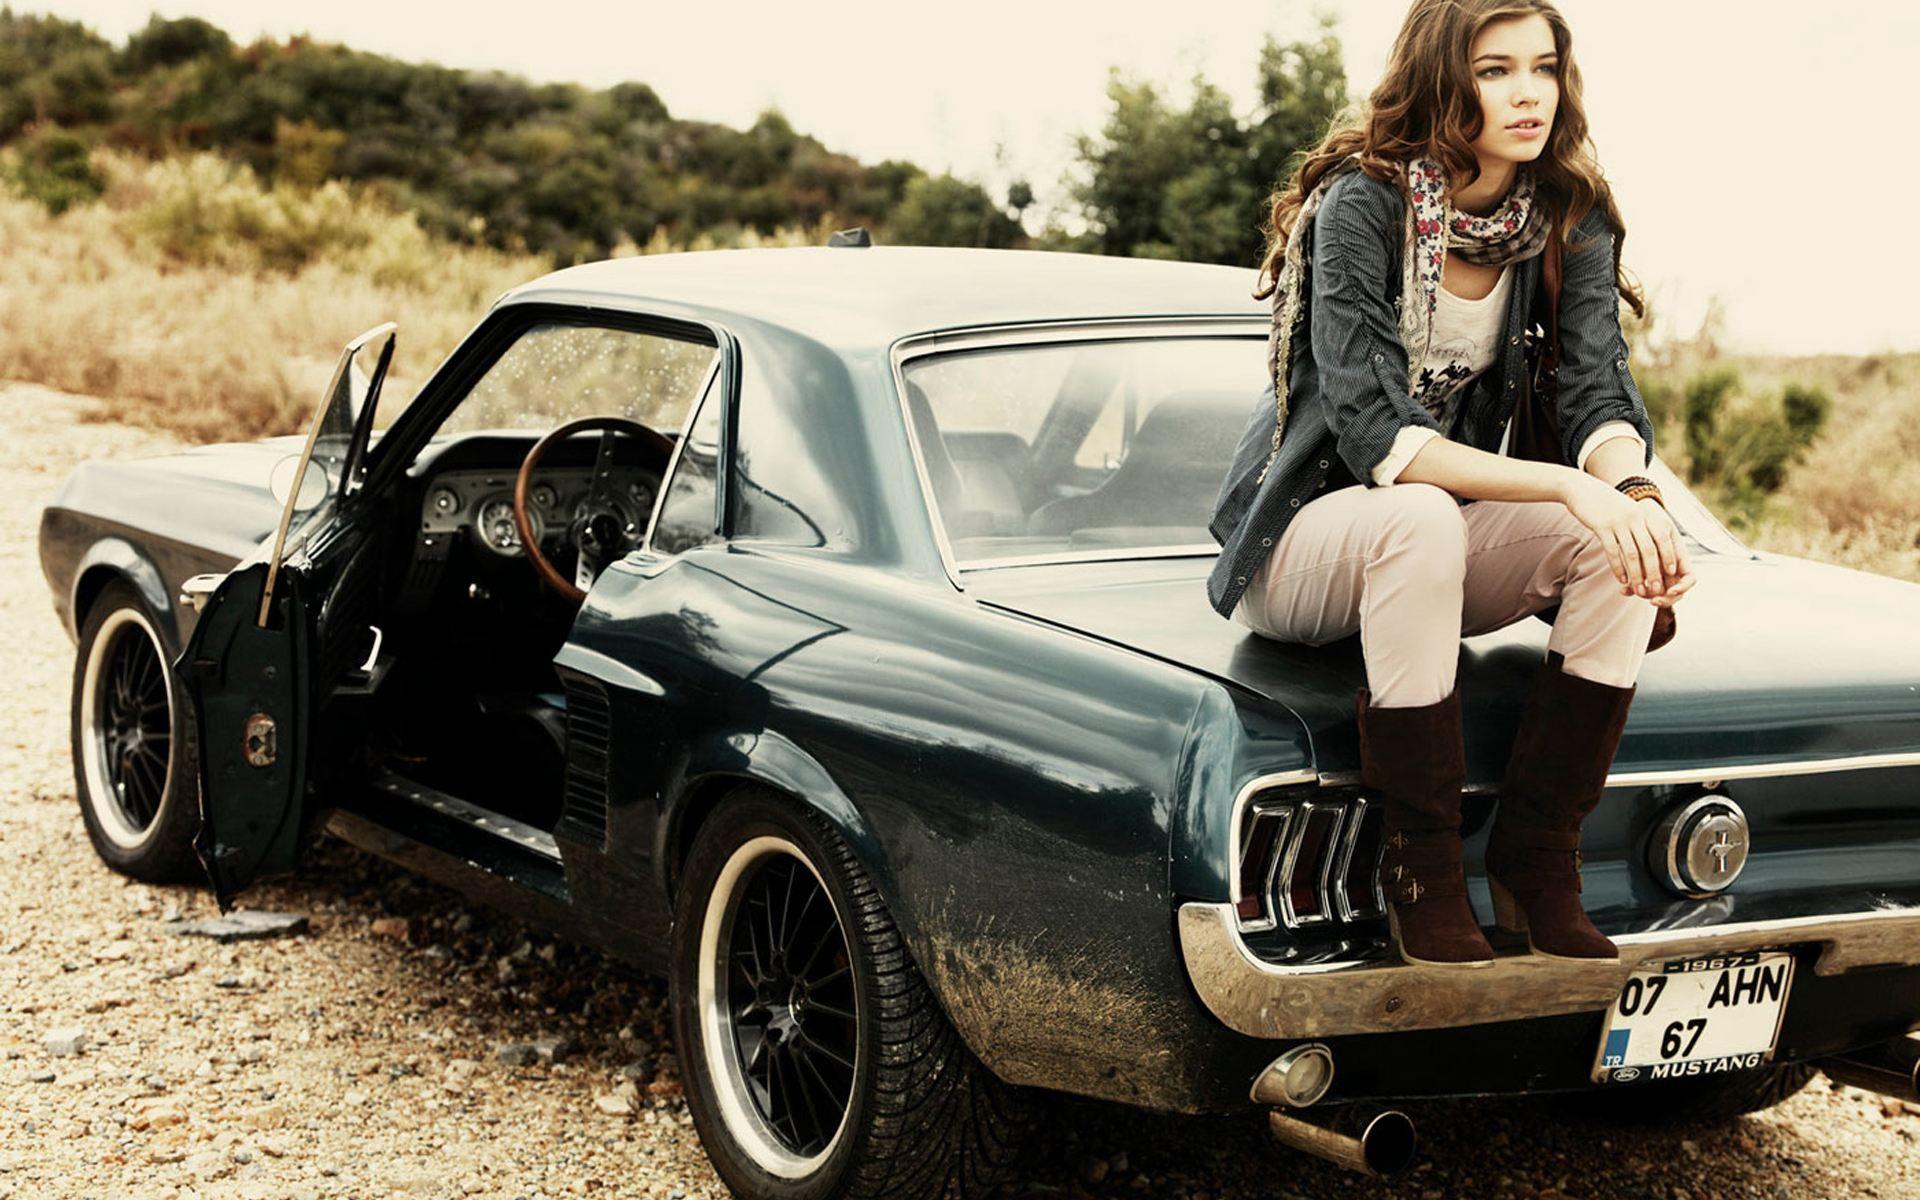 Ford Mustang Girl